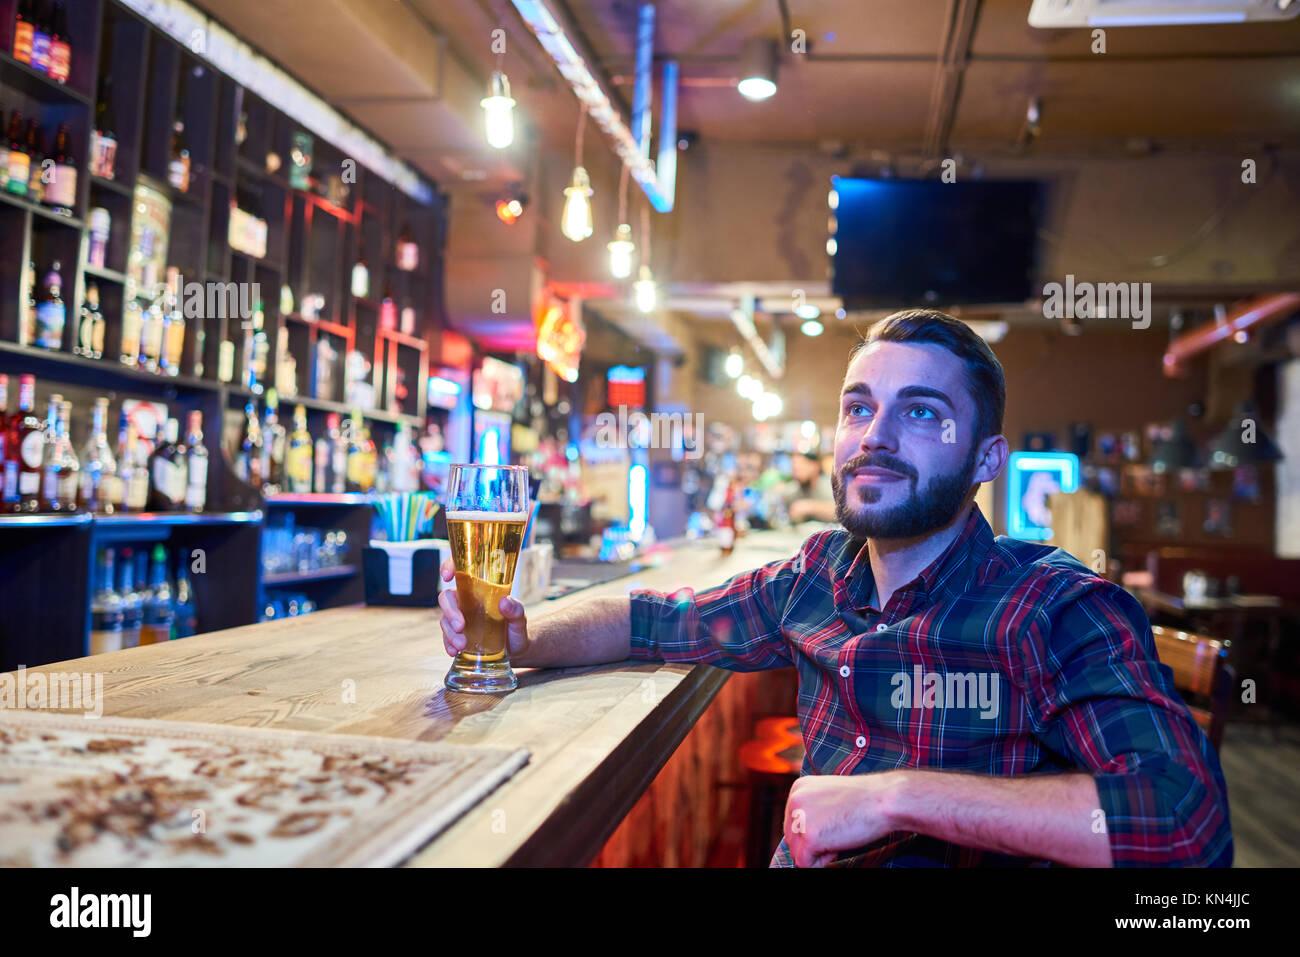 Man Watching TV in Beer Pub - Stock Image